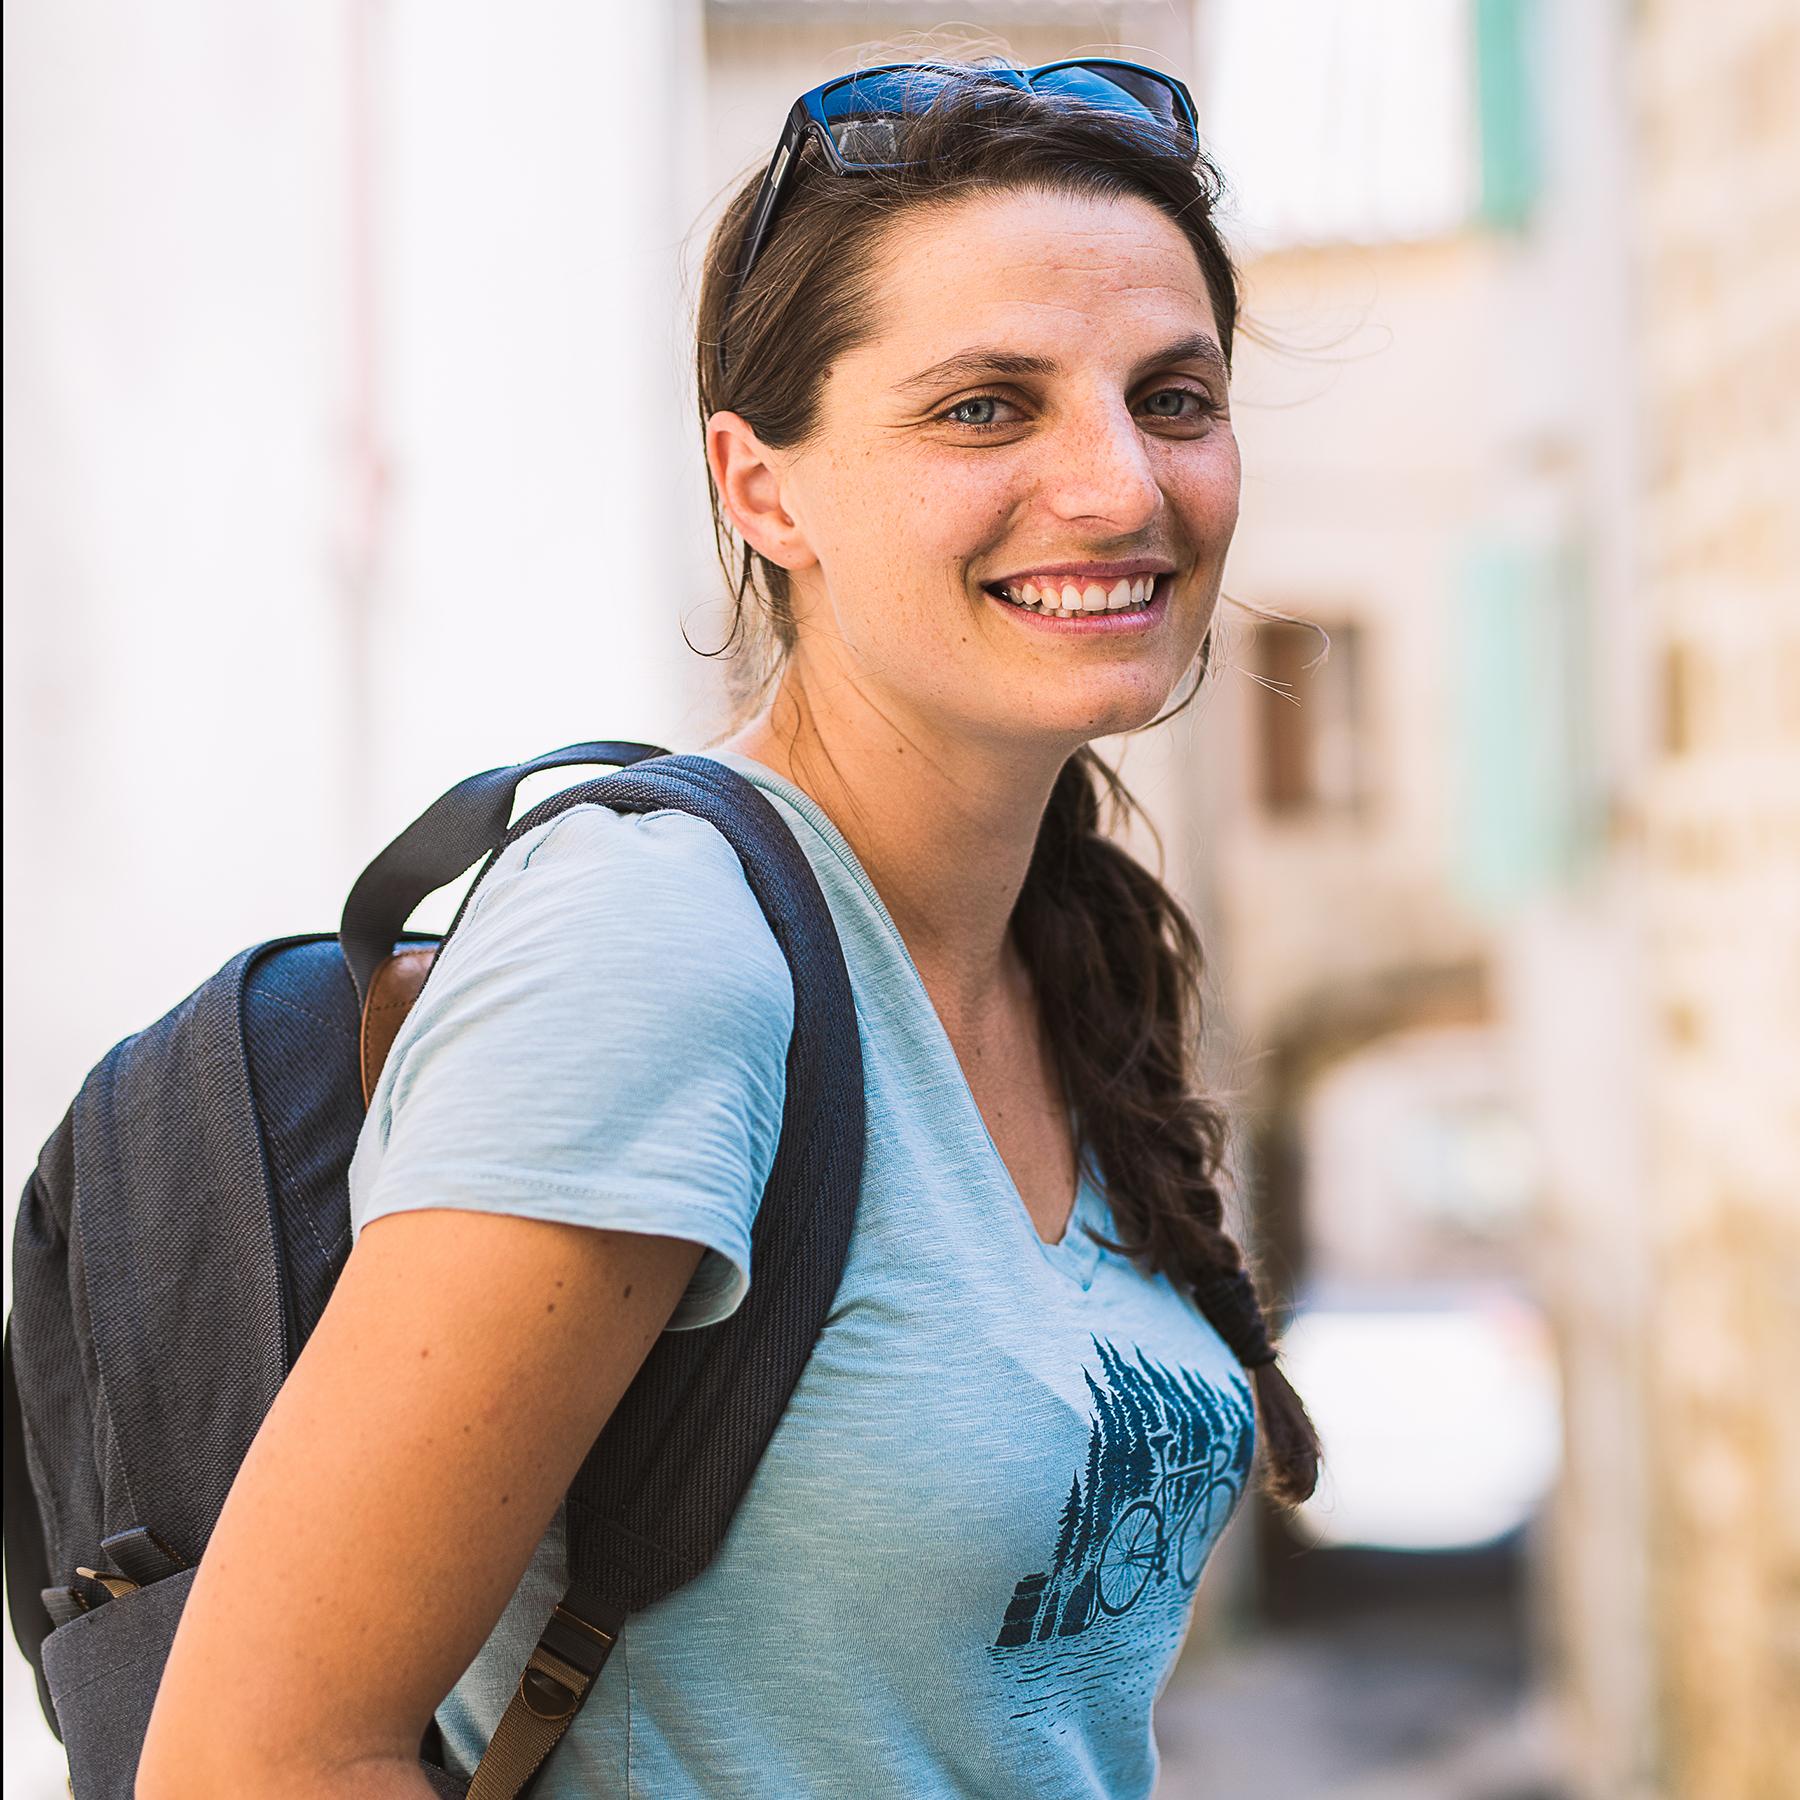 la cyclonomade - laura Pedebas - cyclotourisme - blog cyclotourisme - plateforme voyage à vélo